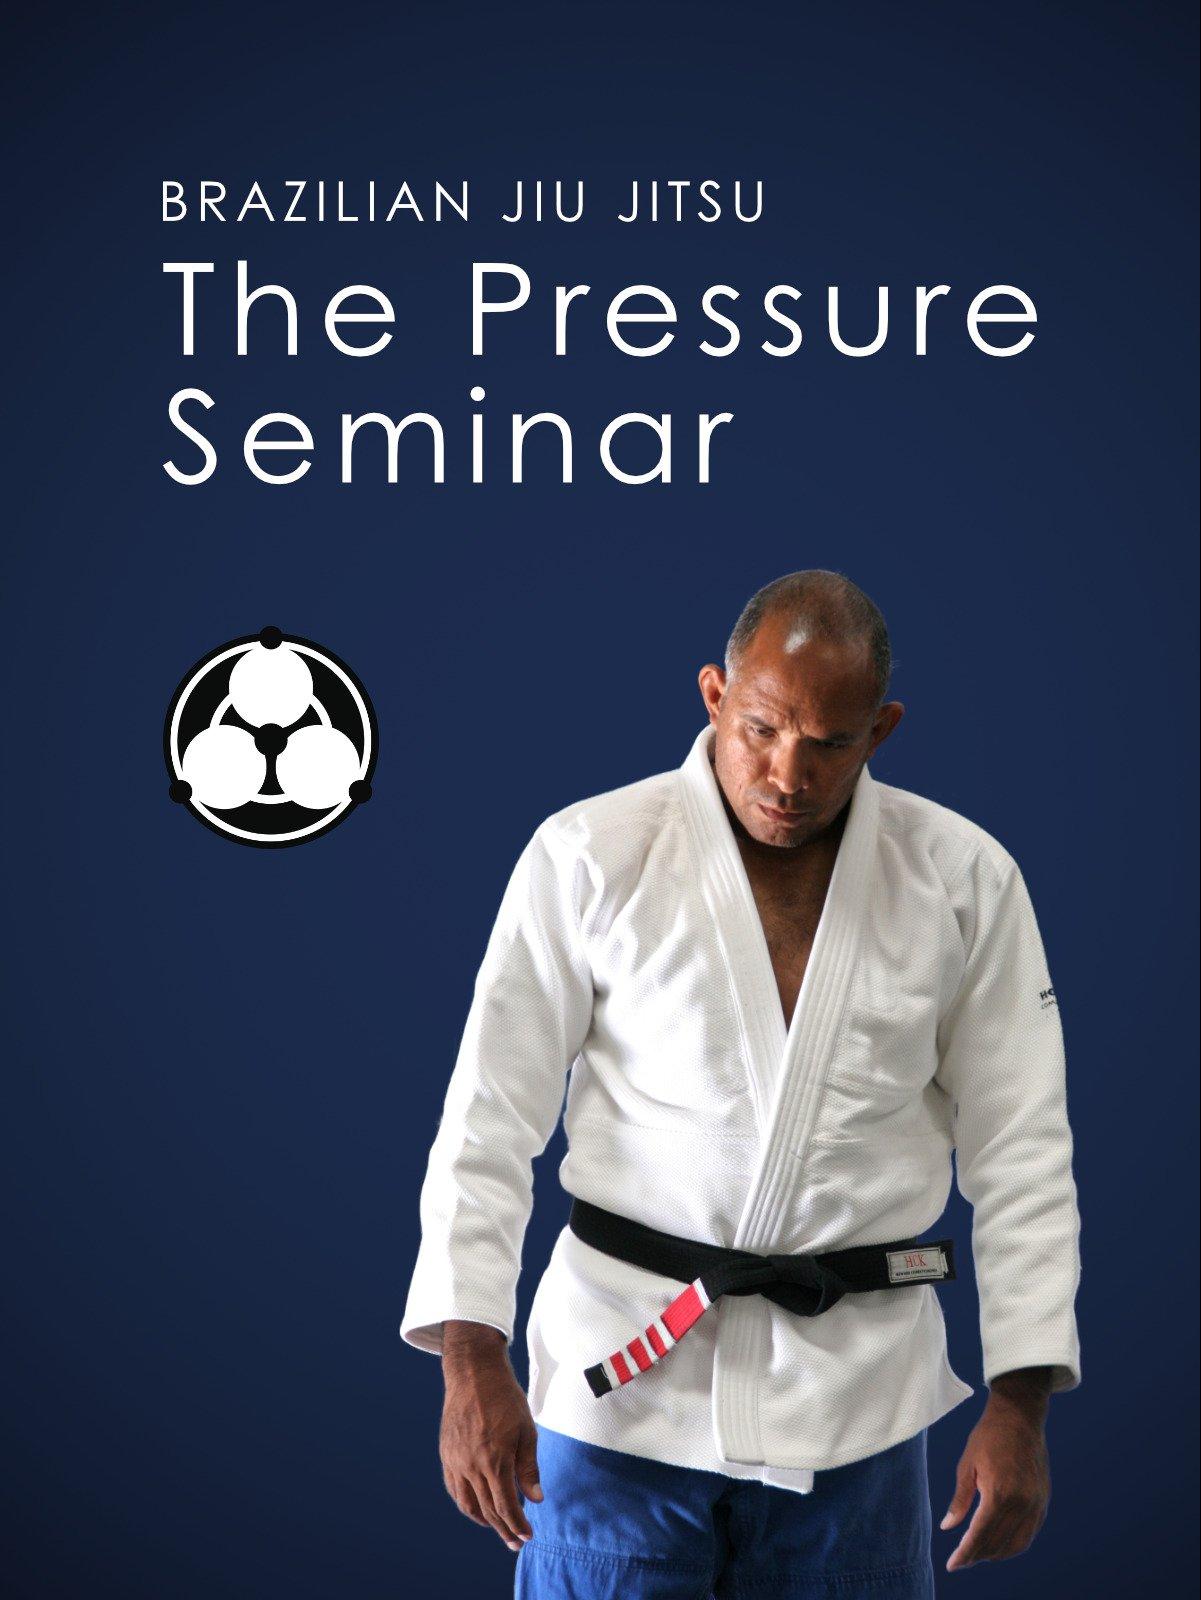 Brazilian Jiu Jitsu | The Pressure Seminar